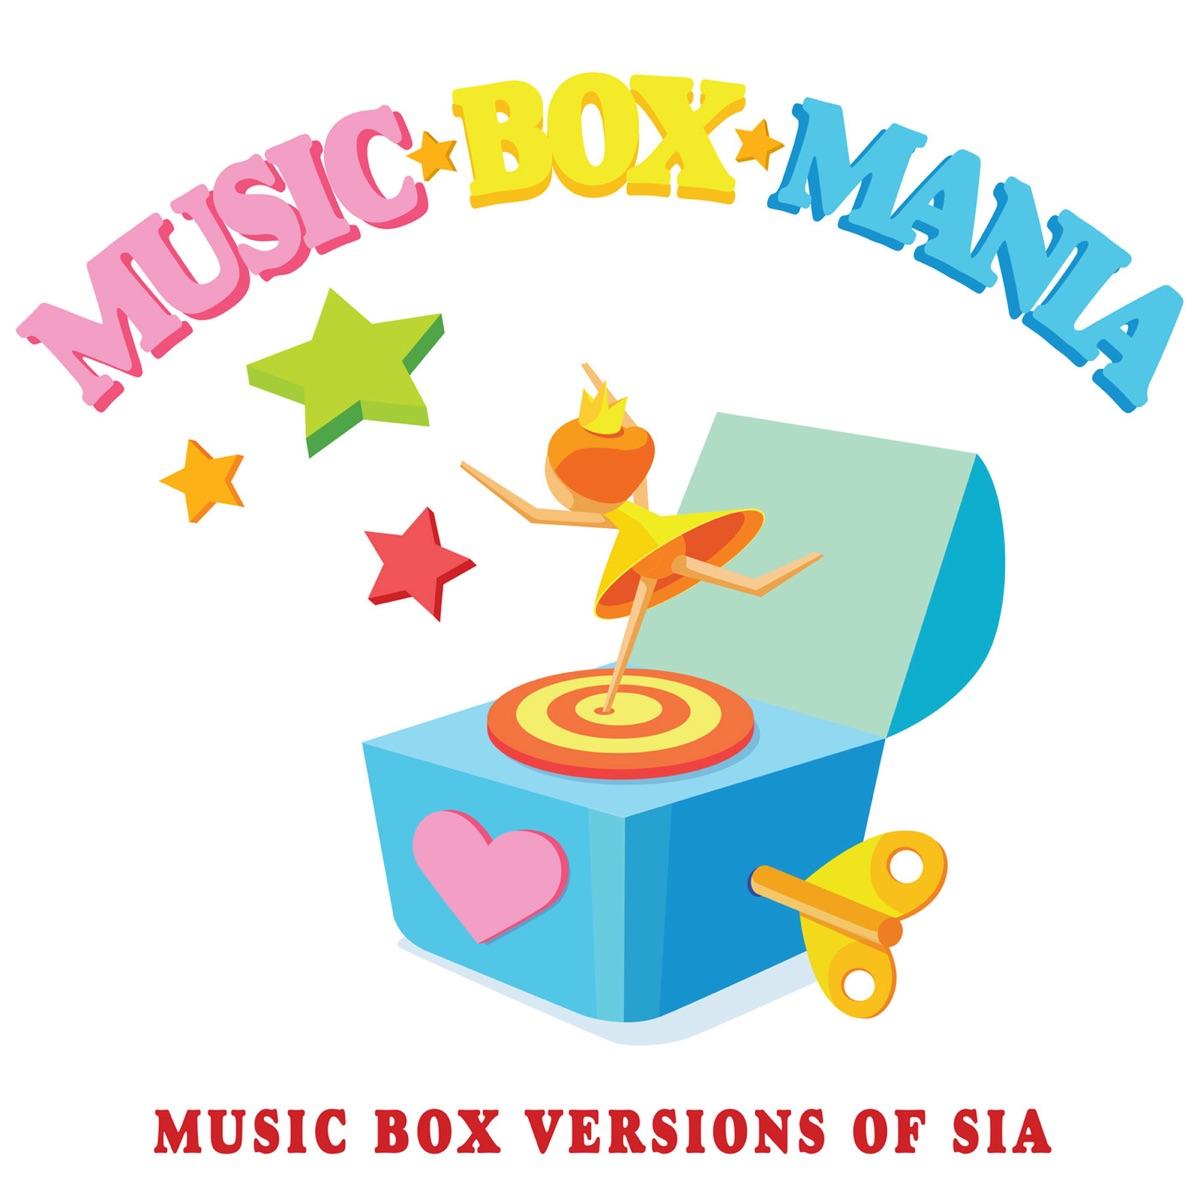 Music Box Versions of Sia Music Box Mania CD cover